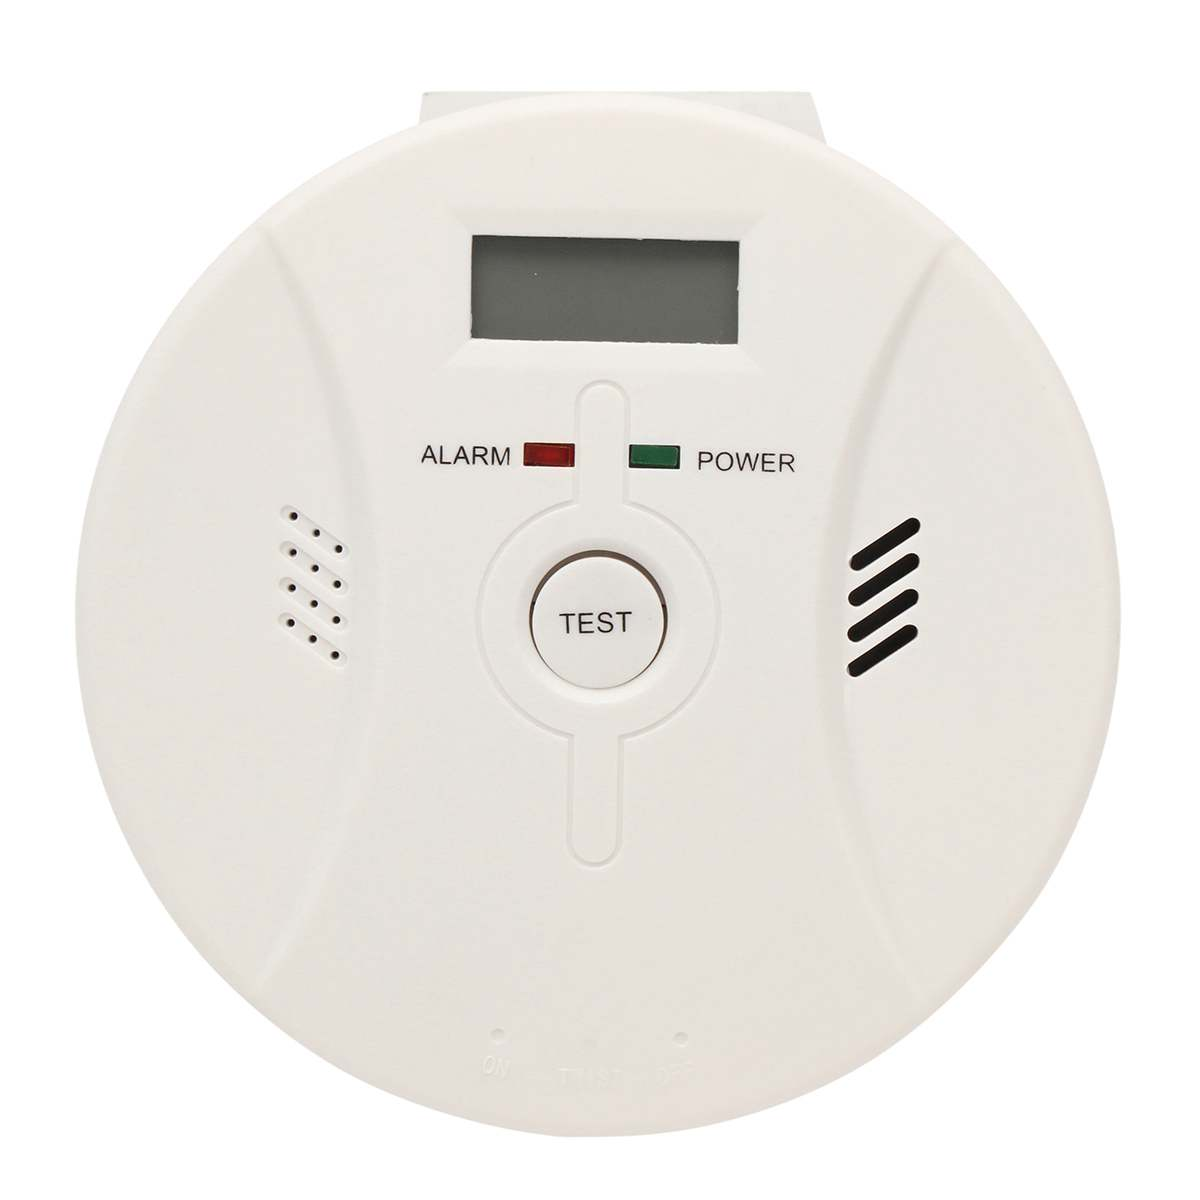 2 in 1 Co Carbon Monoxide Detector LED Digital Gas Smoke Alarm Home Security  Warning Sensor